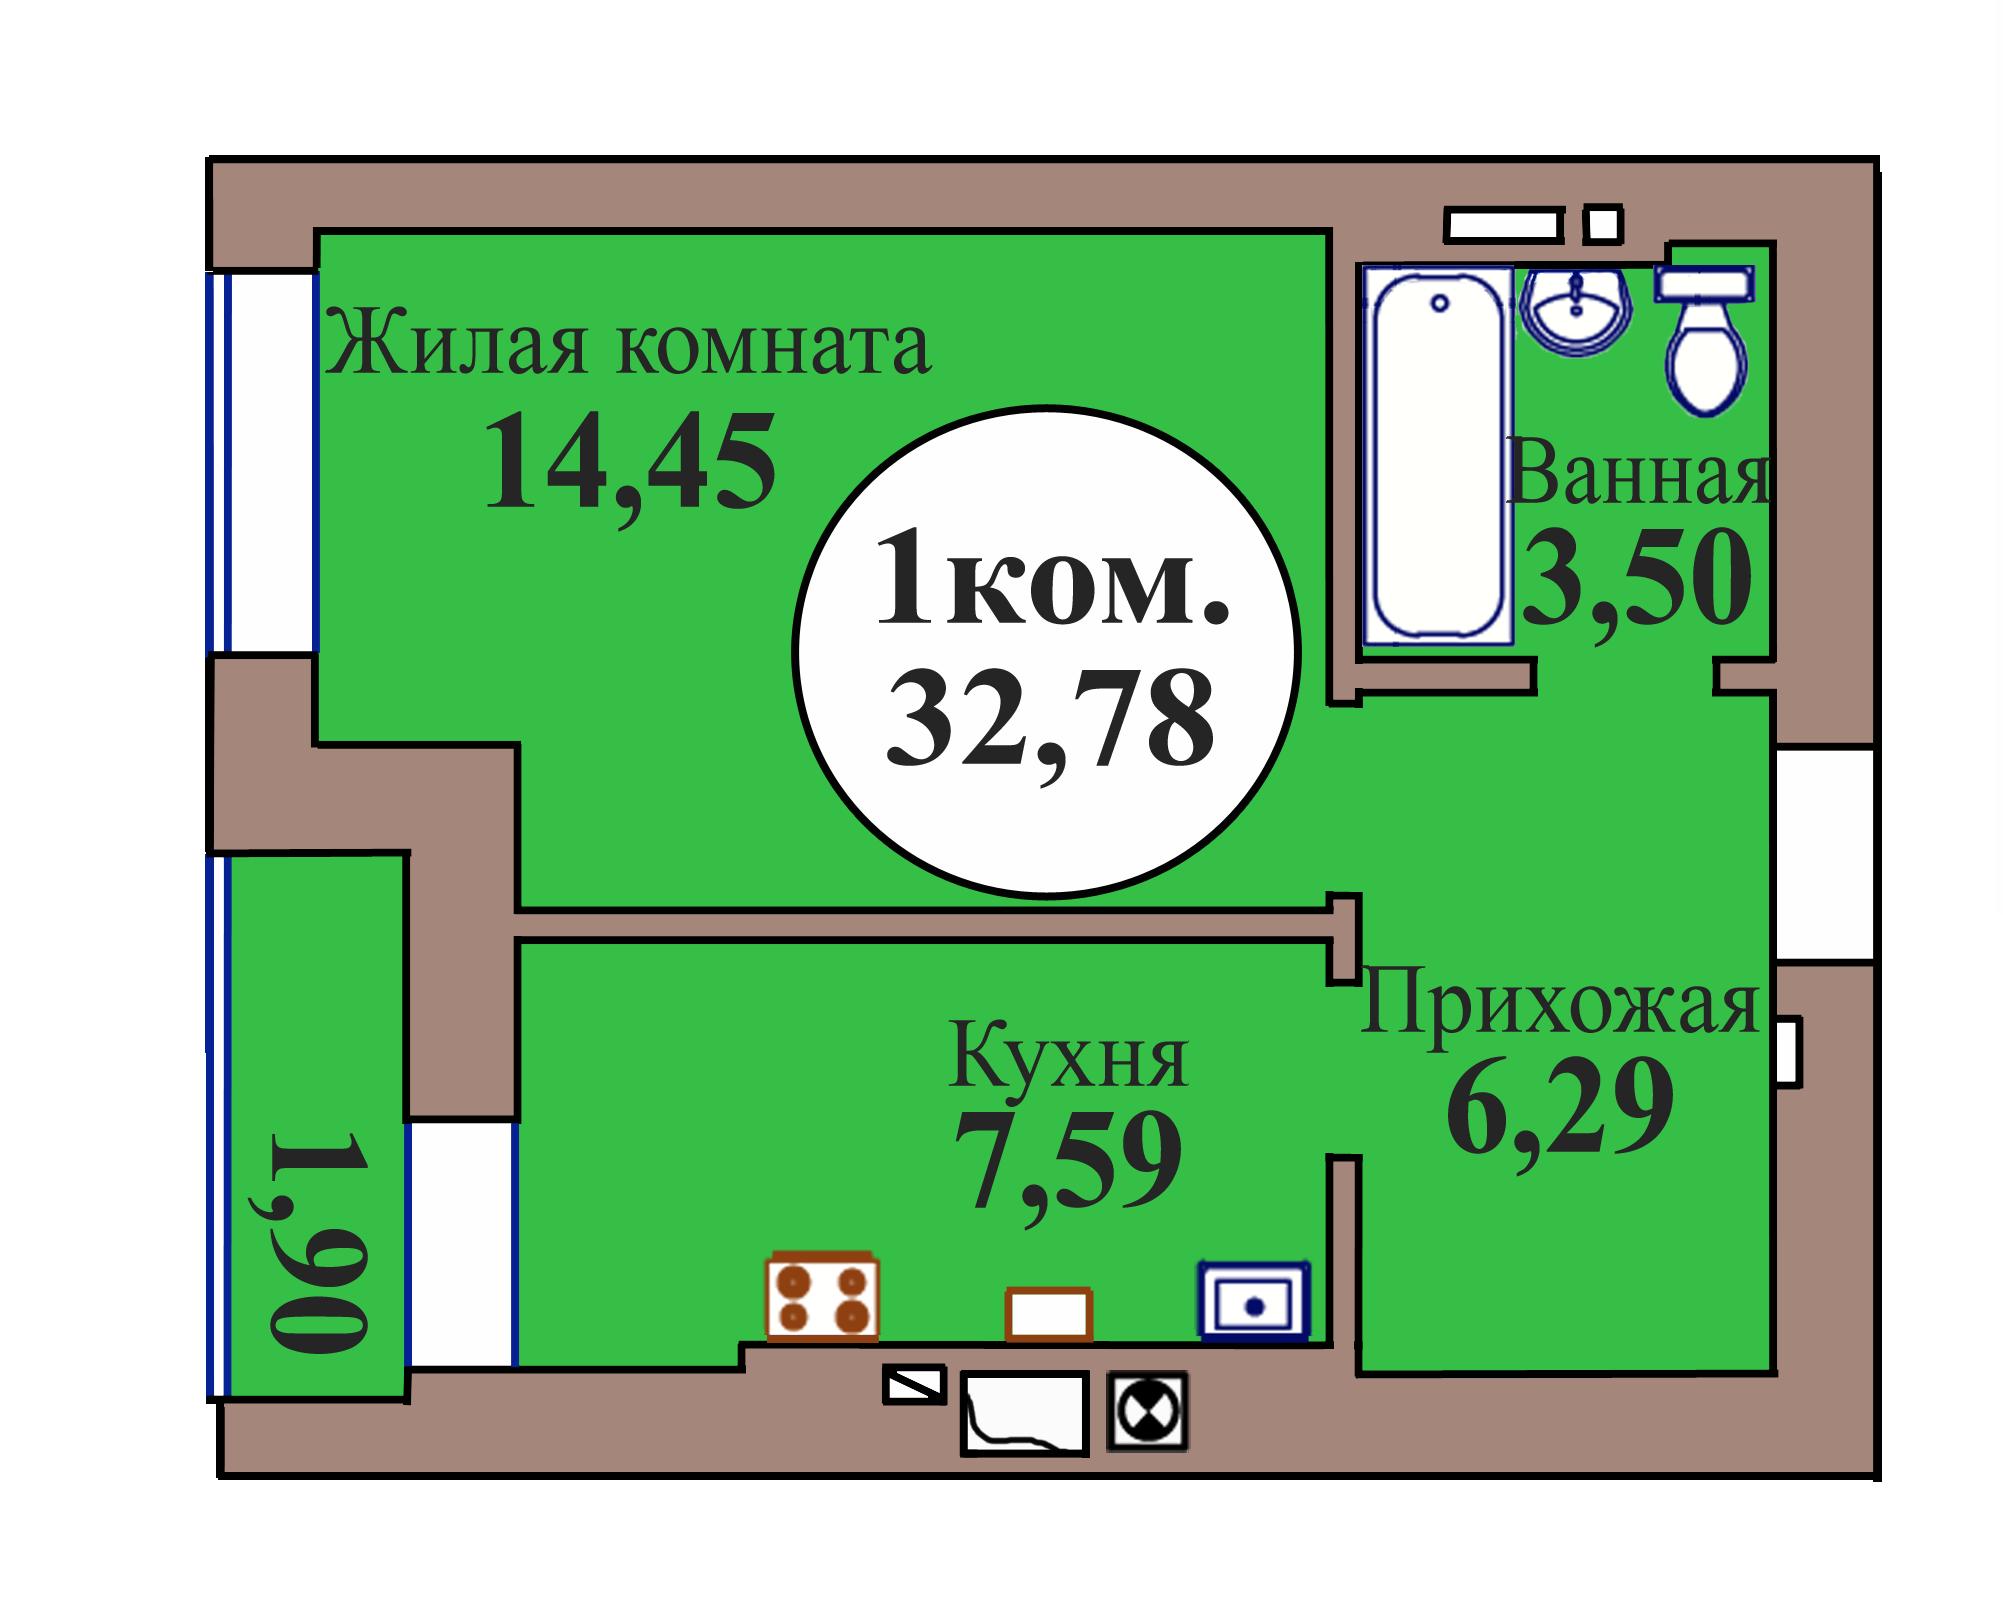 1-комн. кв. по пер. Калининградский, 5 кв. 75 в Калининграде